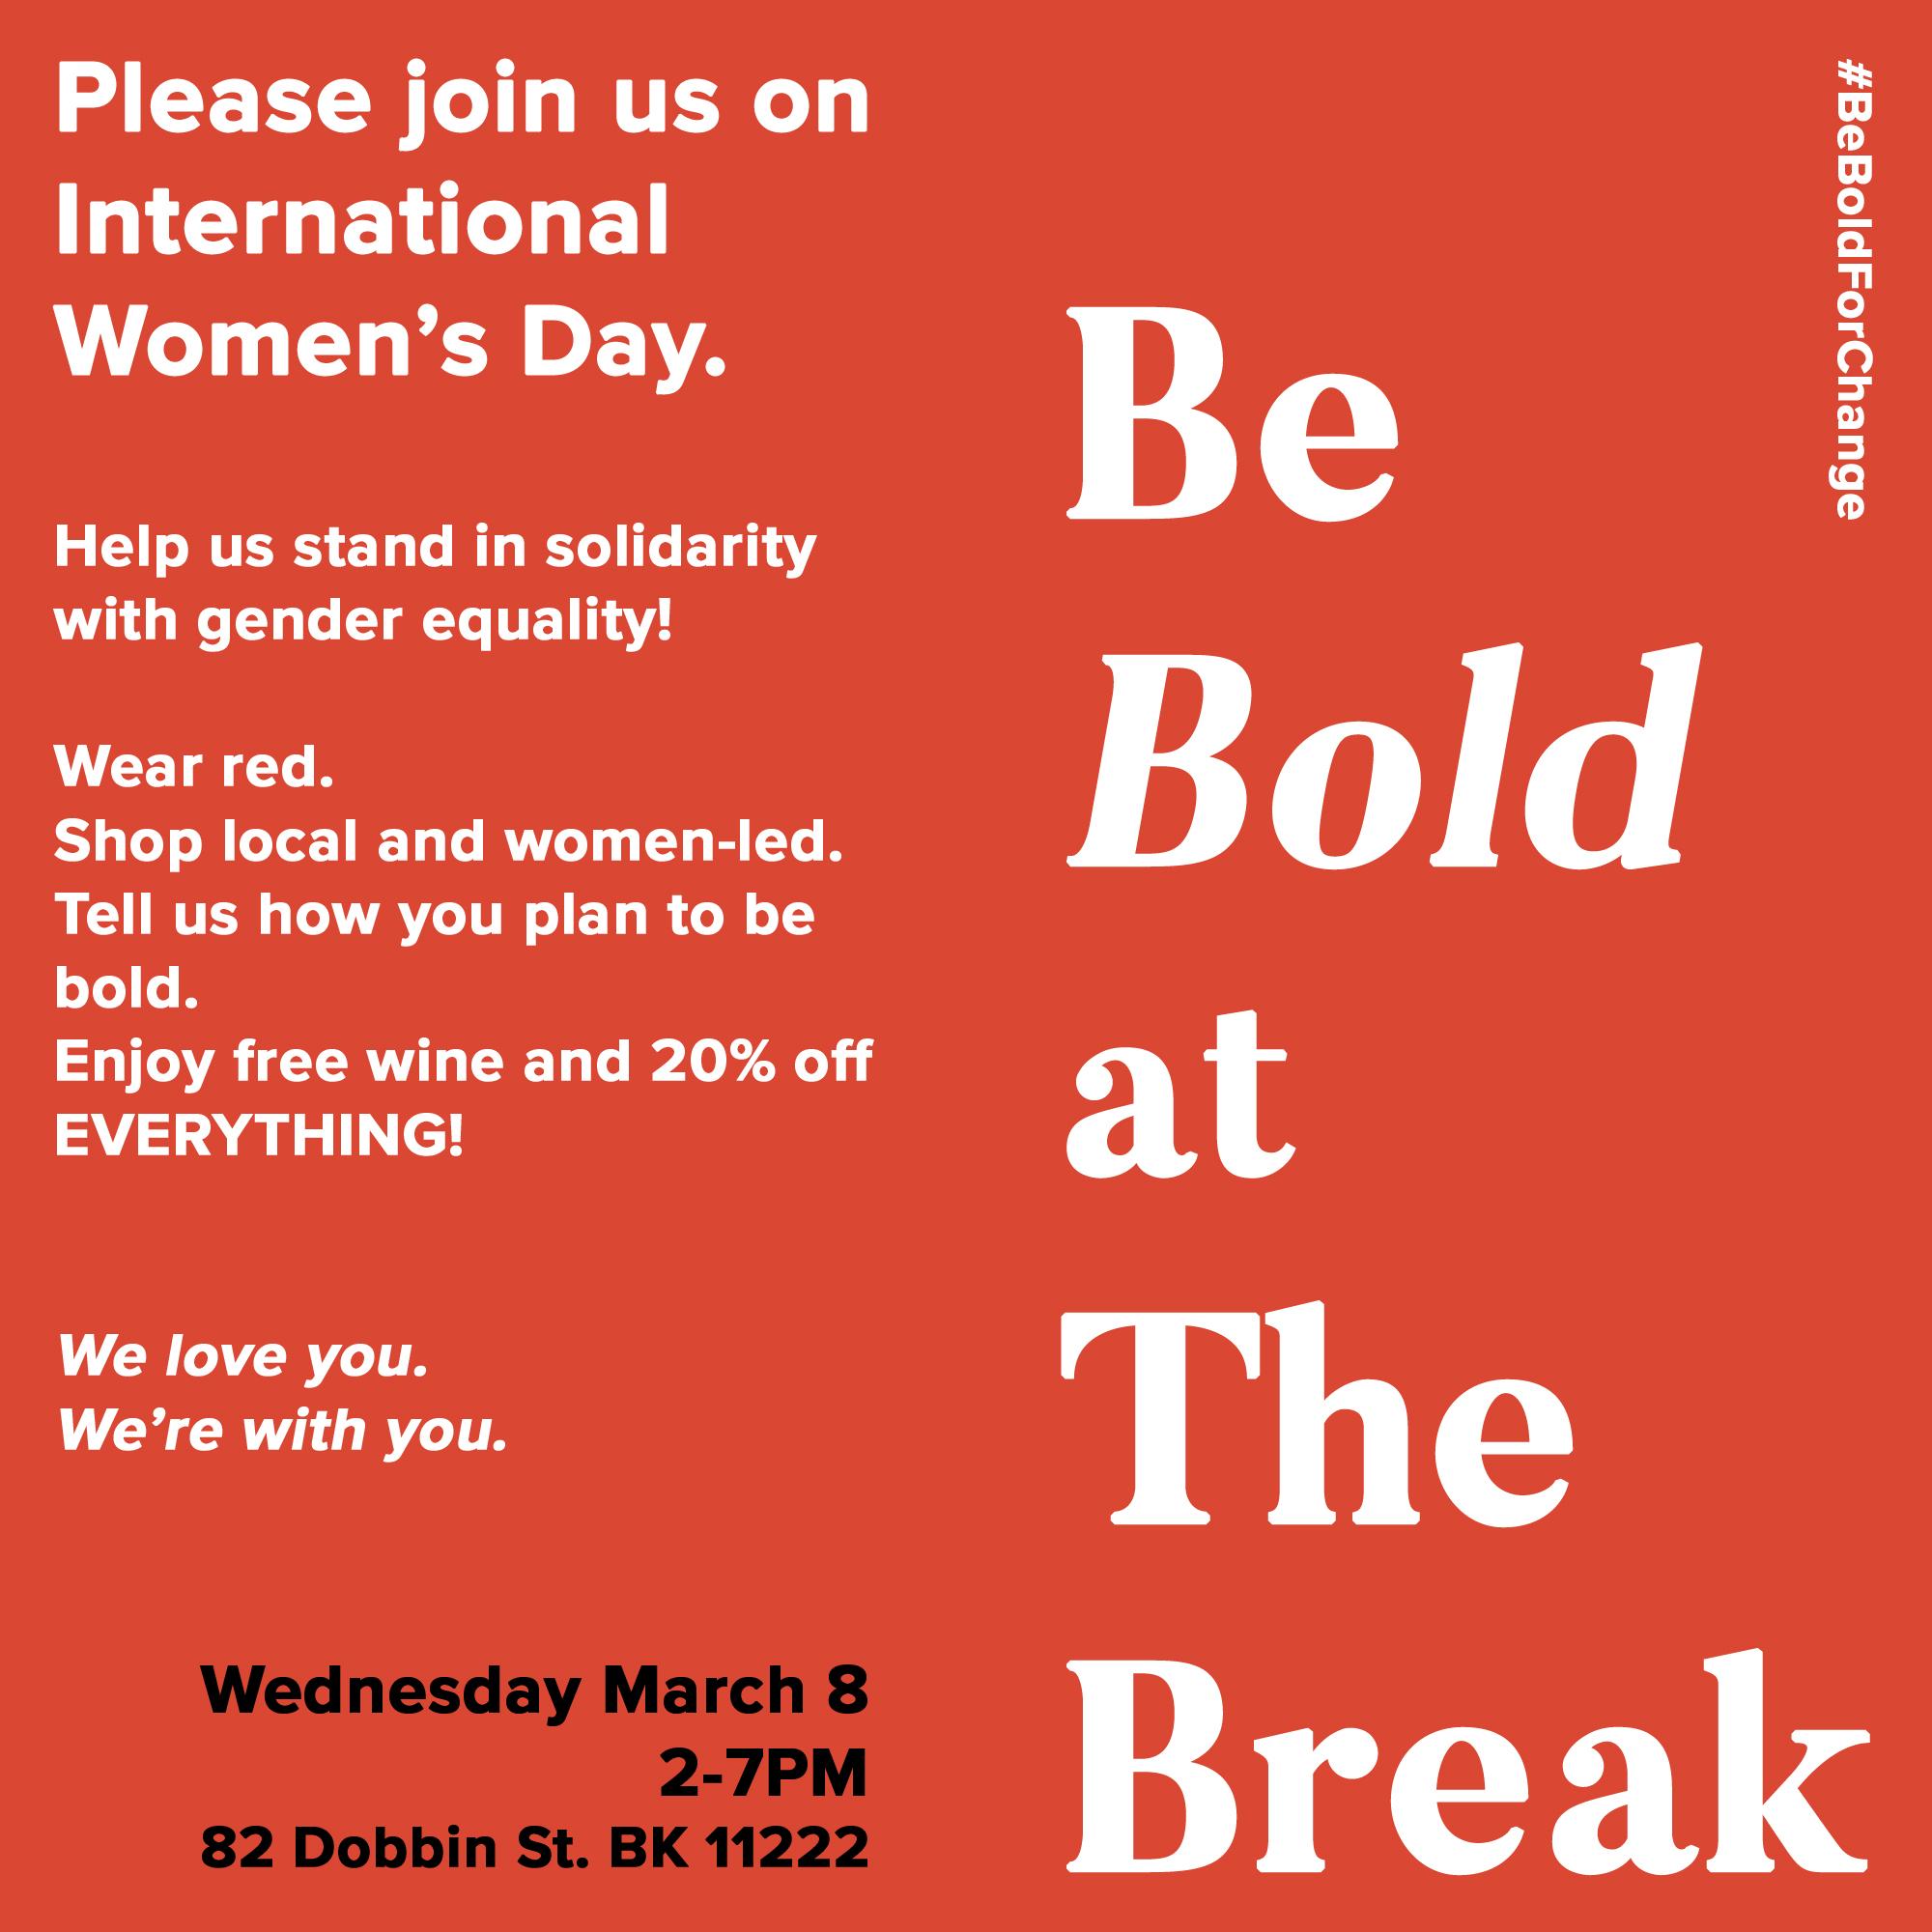 International-Women's-Day-Flyer.jpg